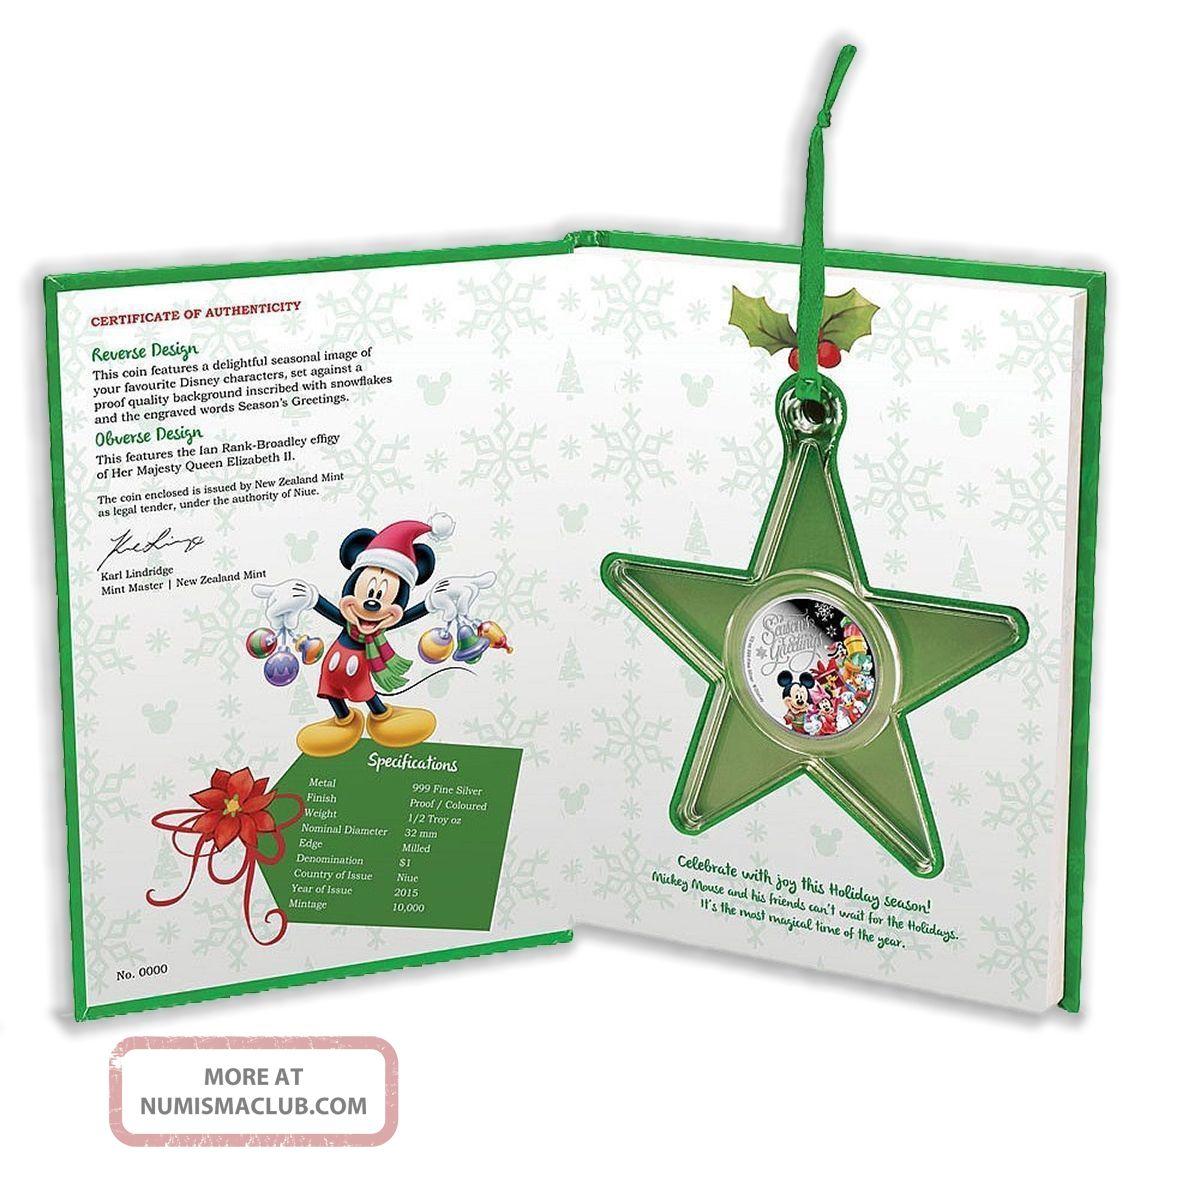 Disney $1 Dollar 1/2 Oz Silver Proof Coin 2015 Season ' S Greetings Christmas Gift Coins: World photo